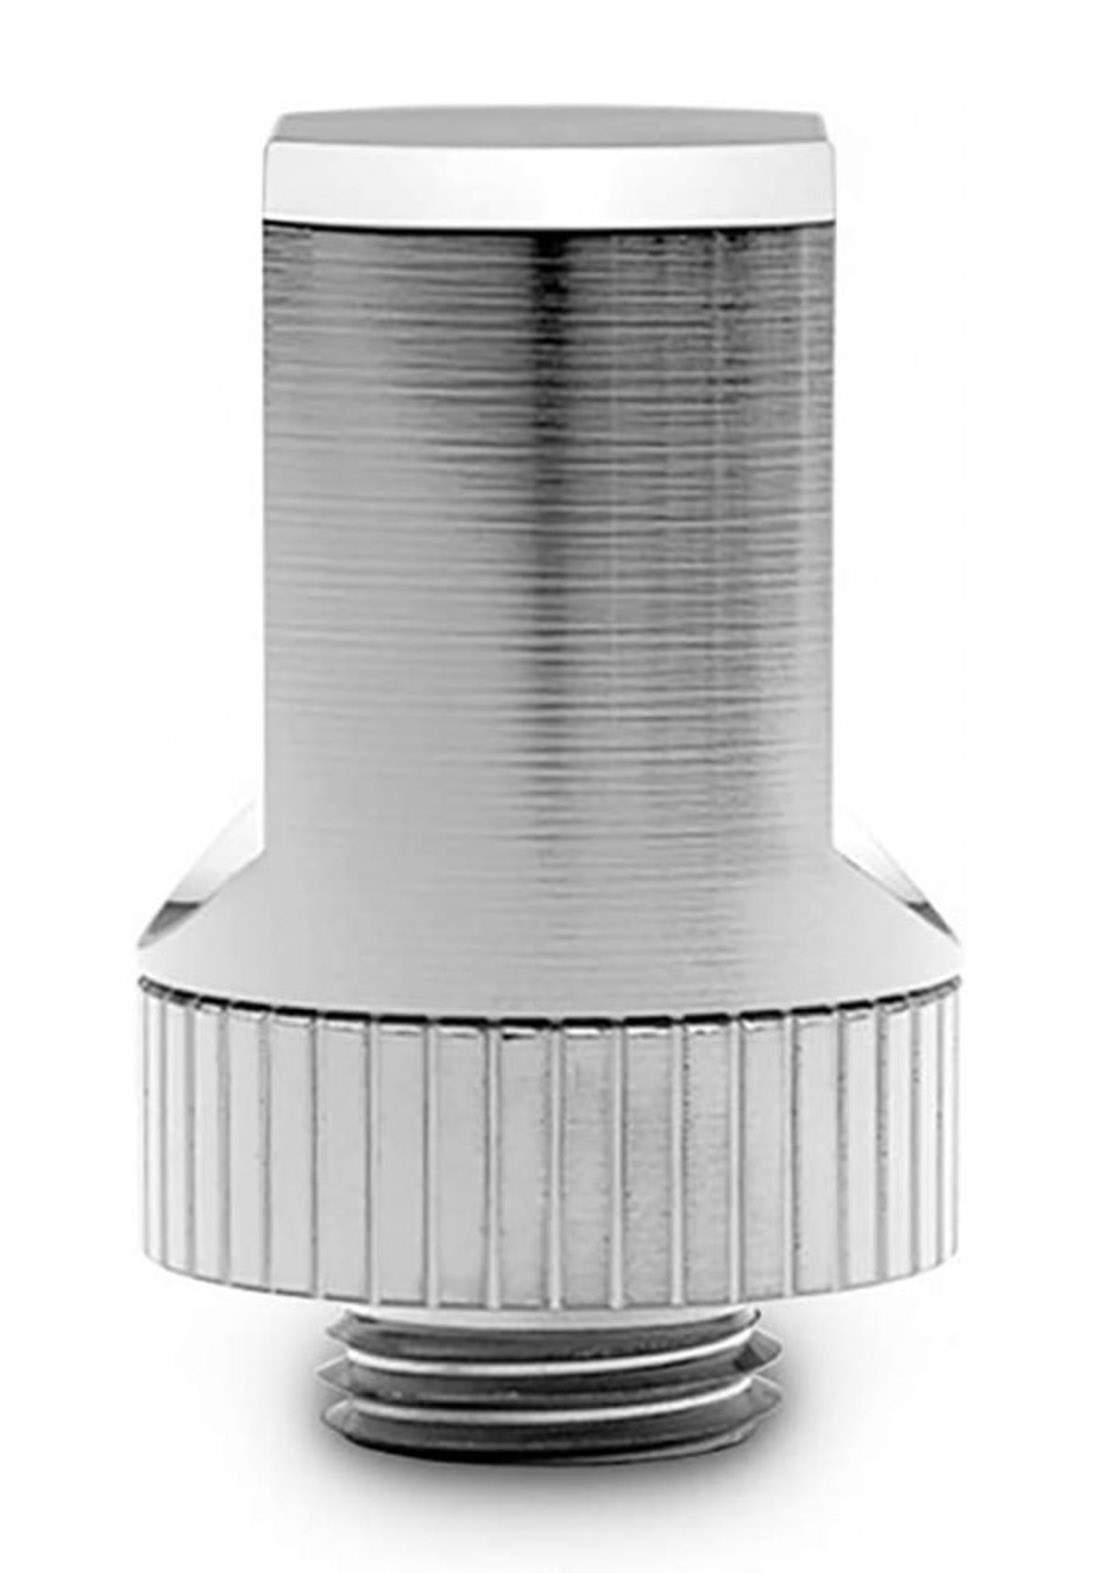 Ek Quantum Torque Rotary t Nickel - Silver